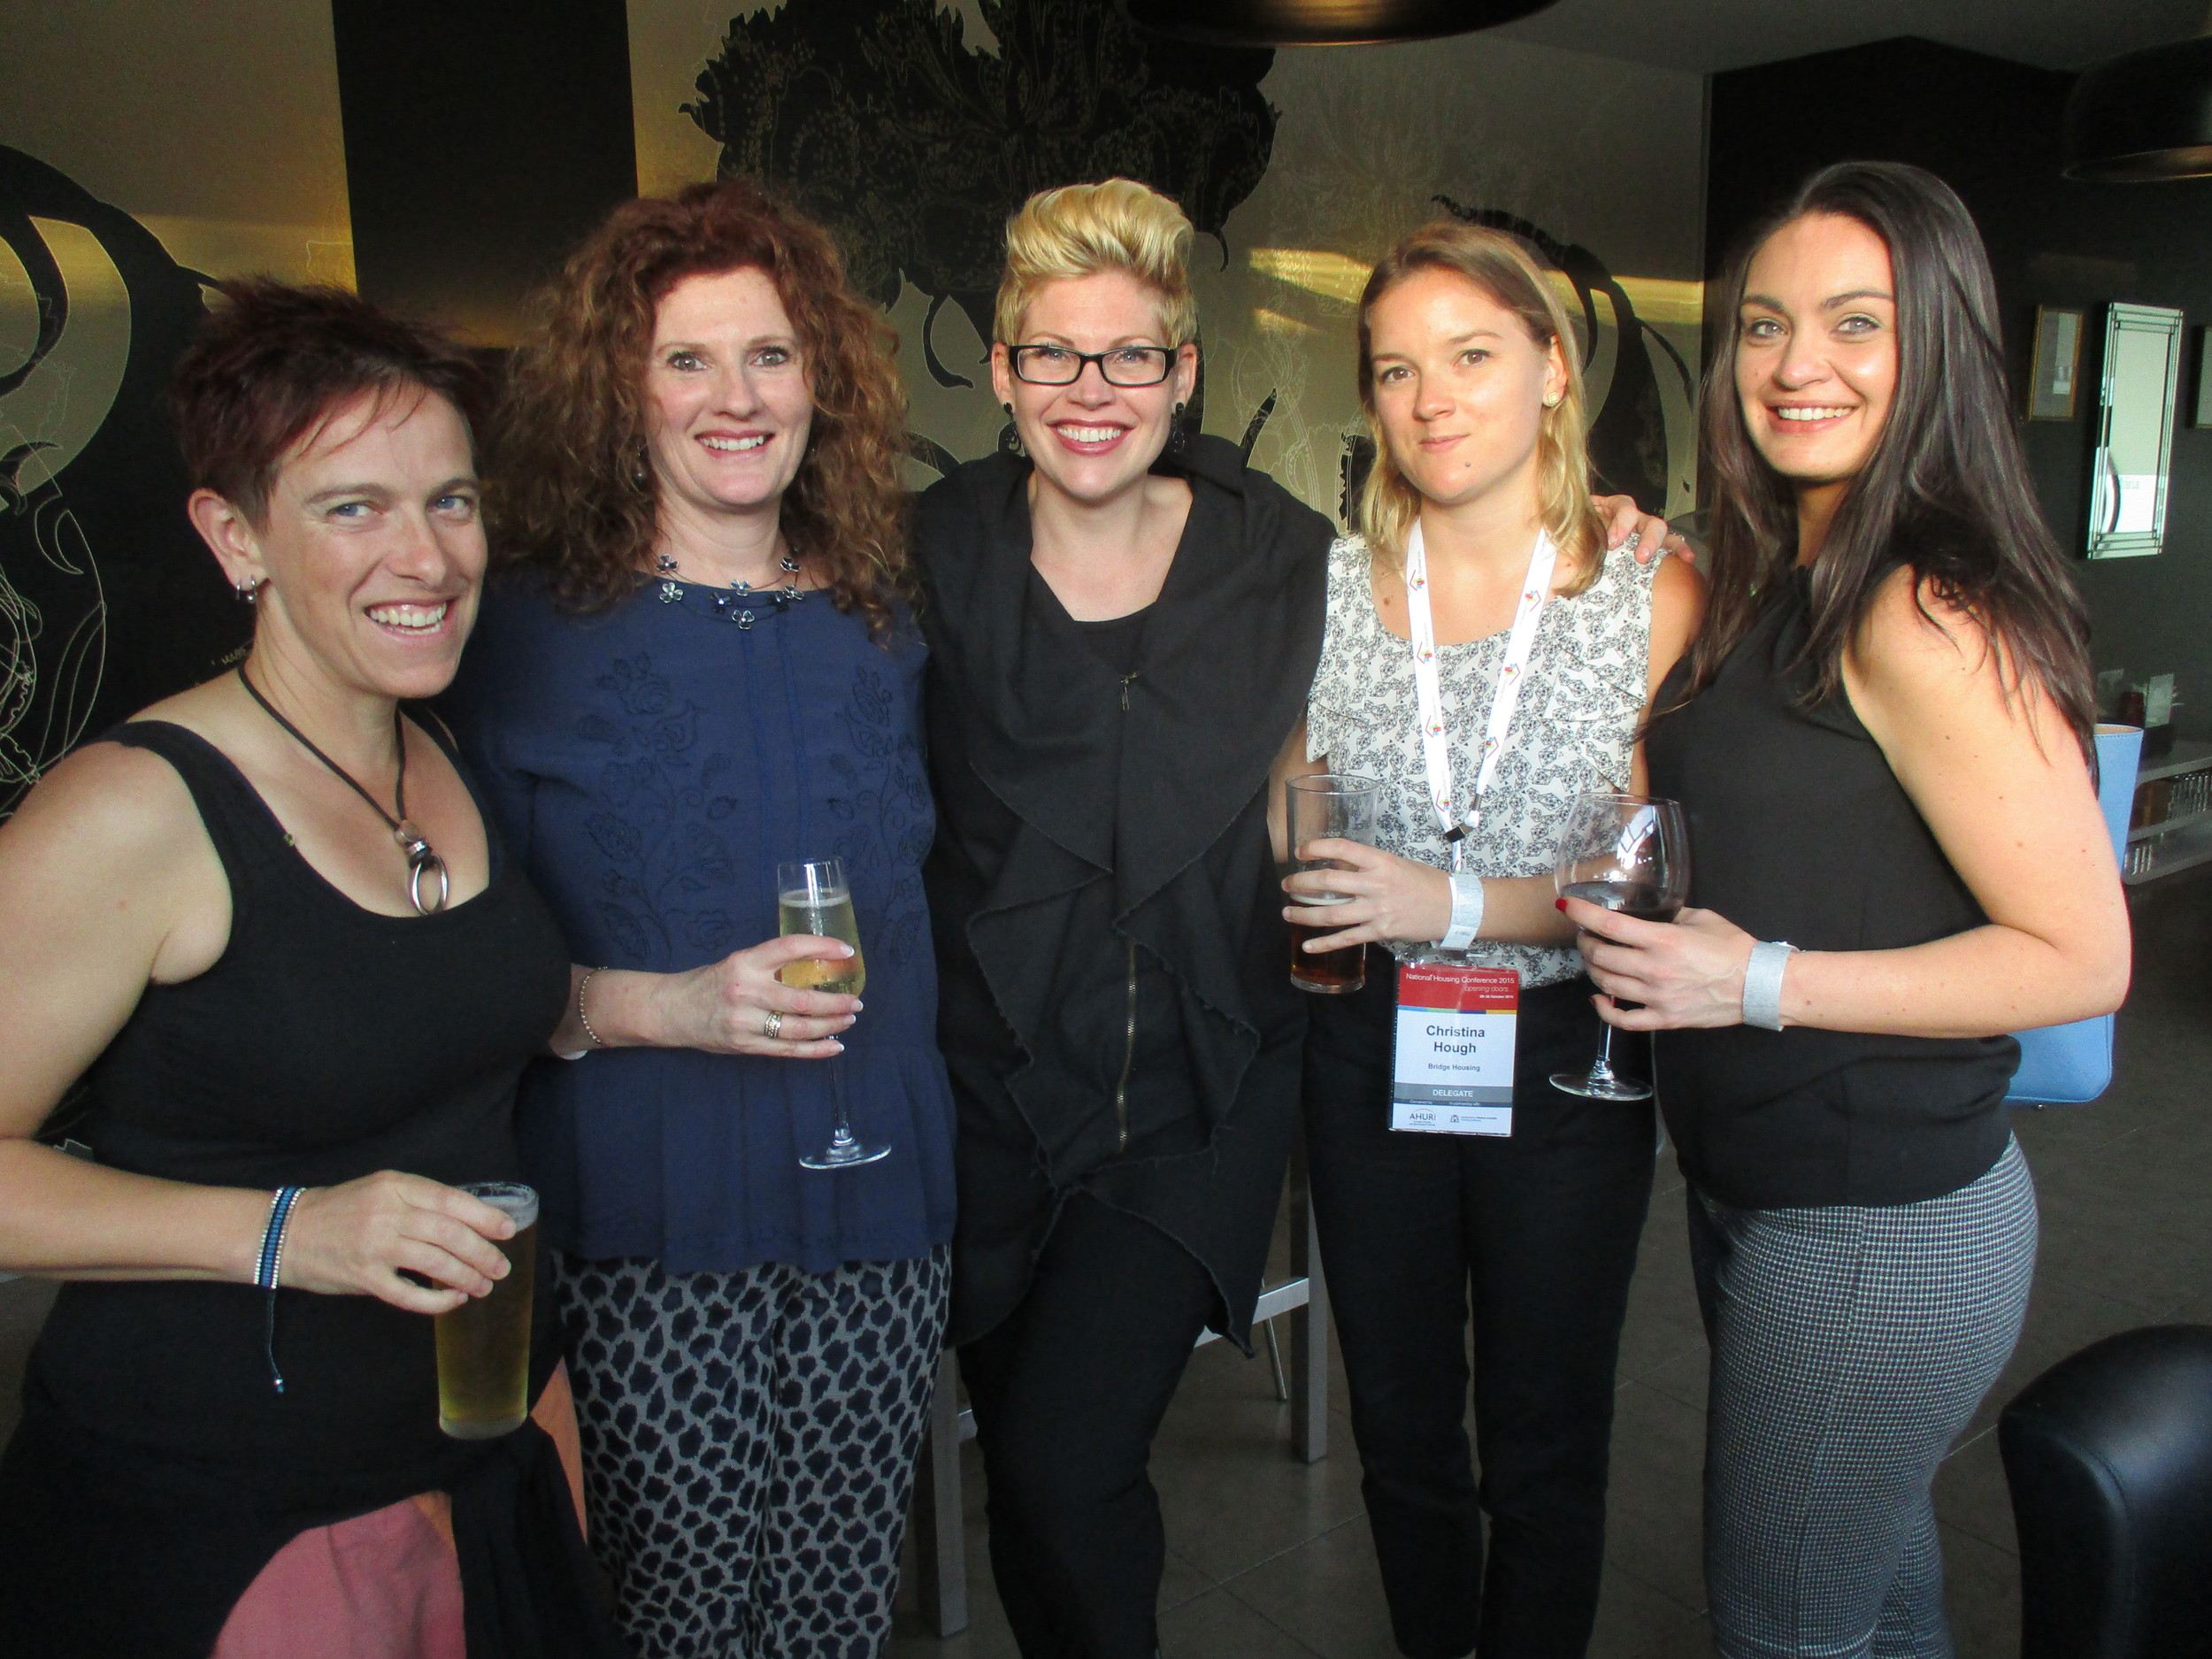 2015-10-29  Perth conference 05.JPG